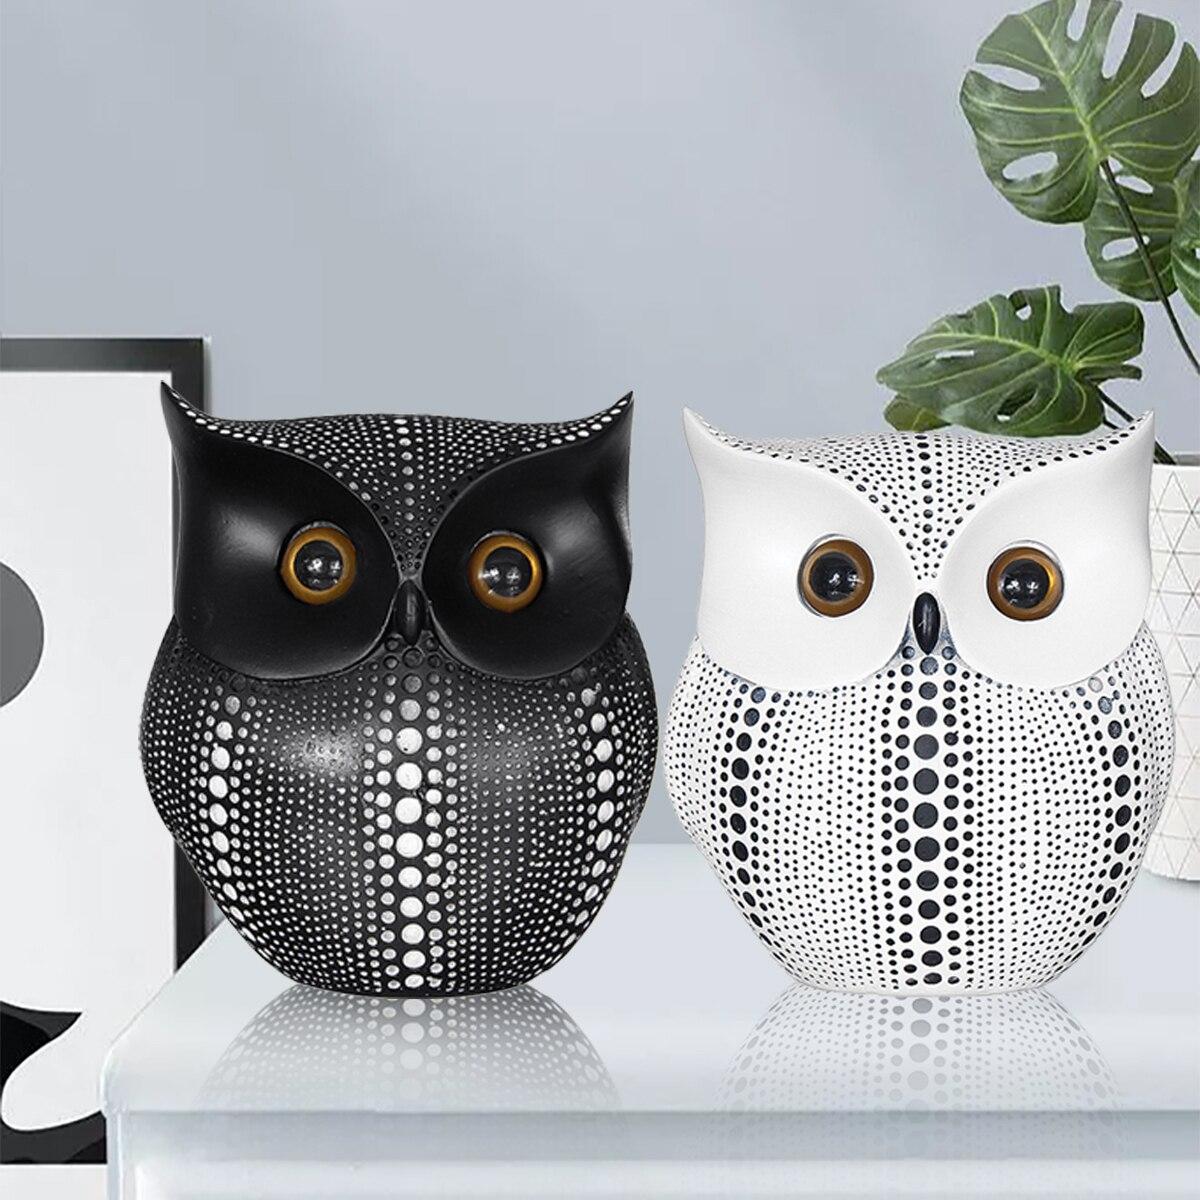 >Nordic Style Minimalist Craft White Black Owls Animal Figurines Resin Miniatures <font><b>Home</b></font> <font><b>Decoration</b></font> Living Room <font><b>Ornaments</b></font> Crafts